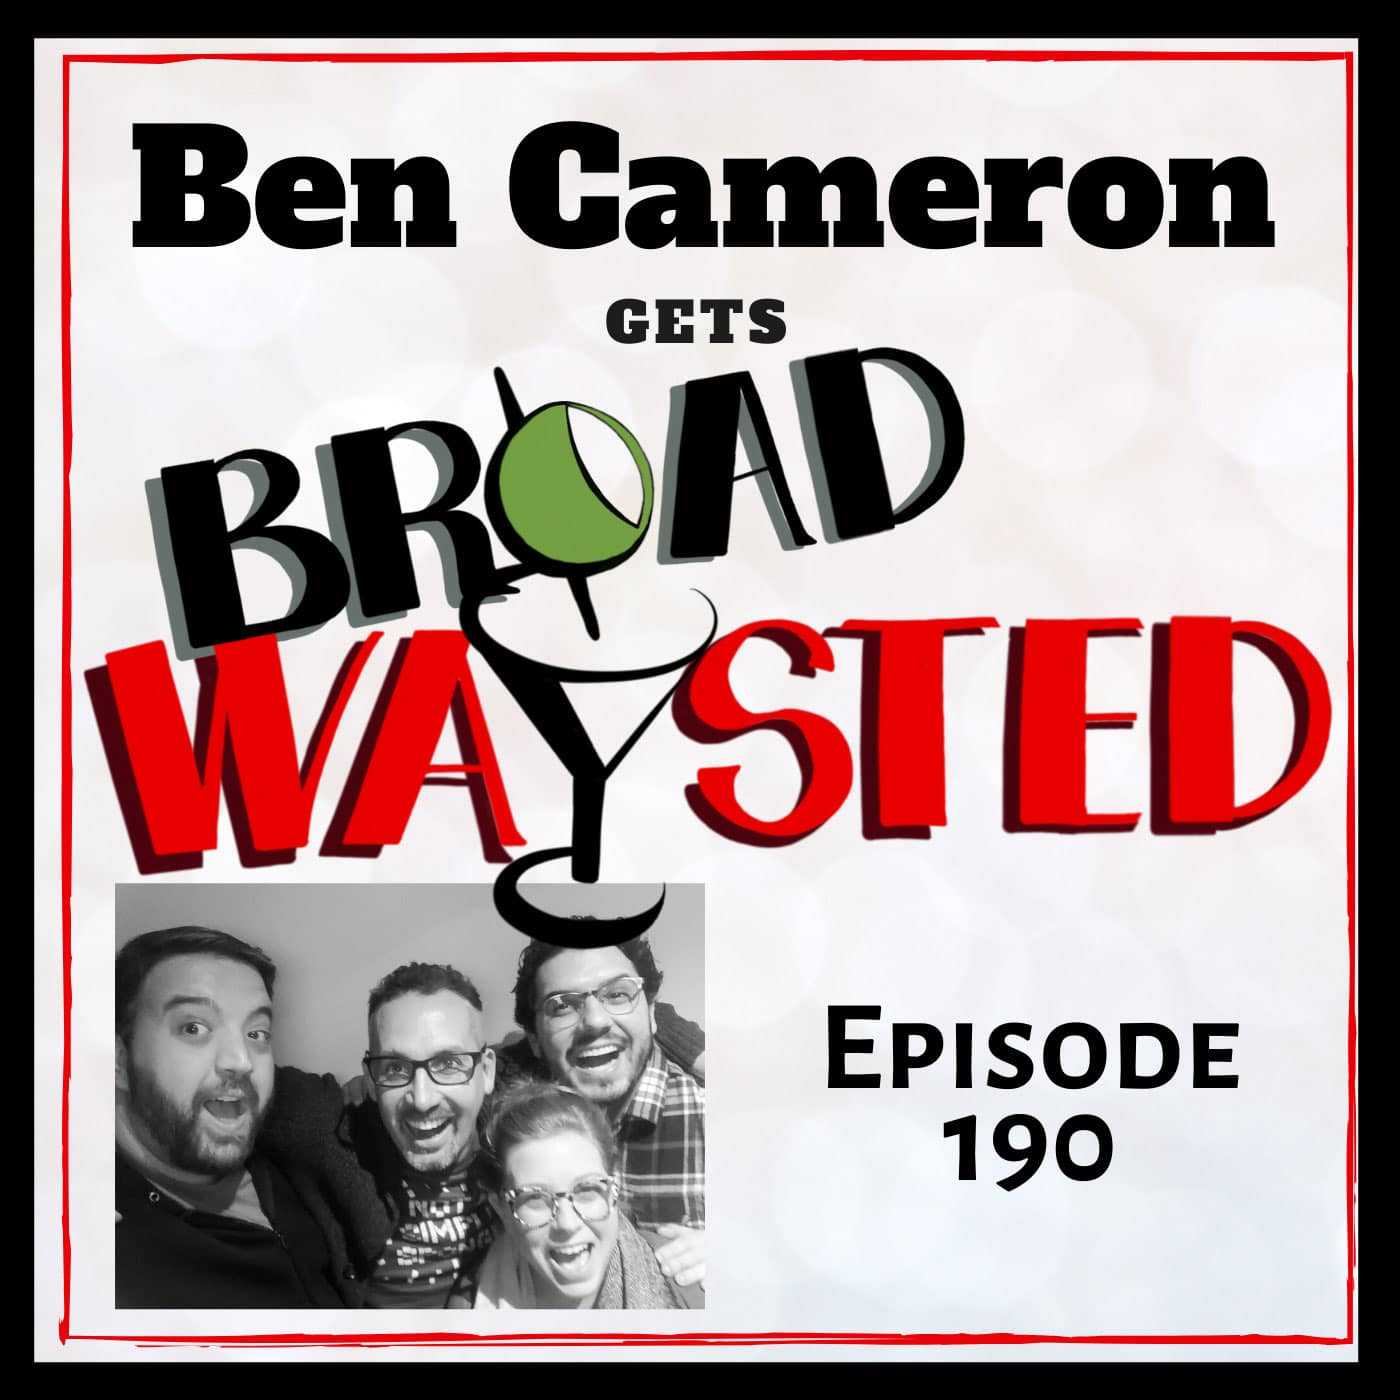 Broadwaysted Episode 190 Ben Cameron